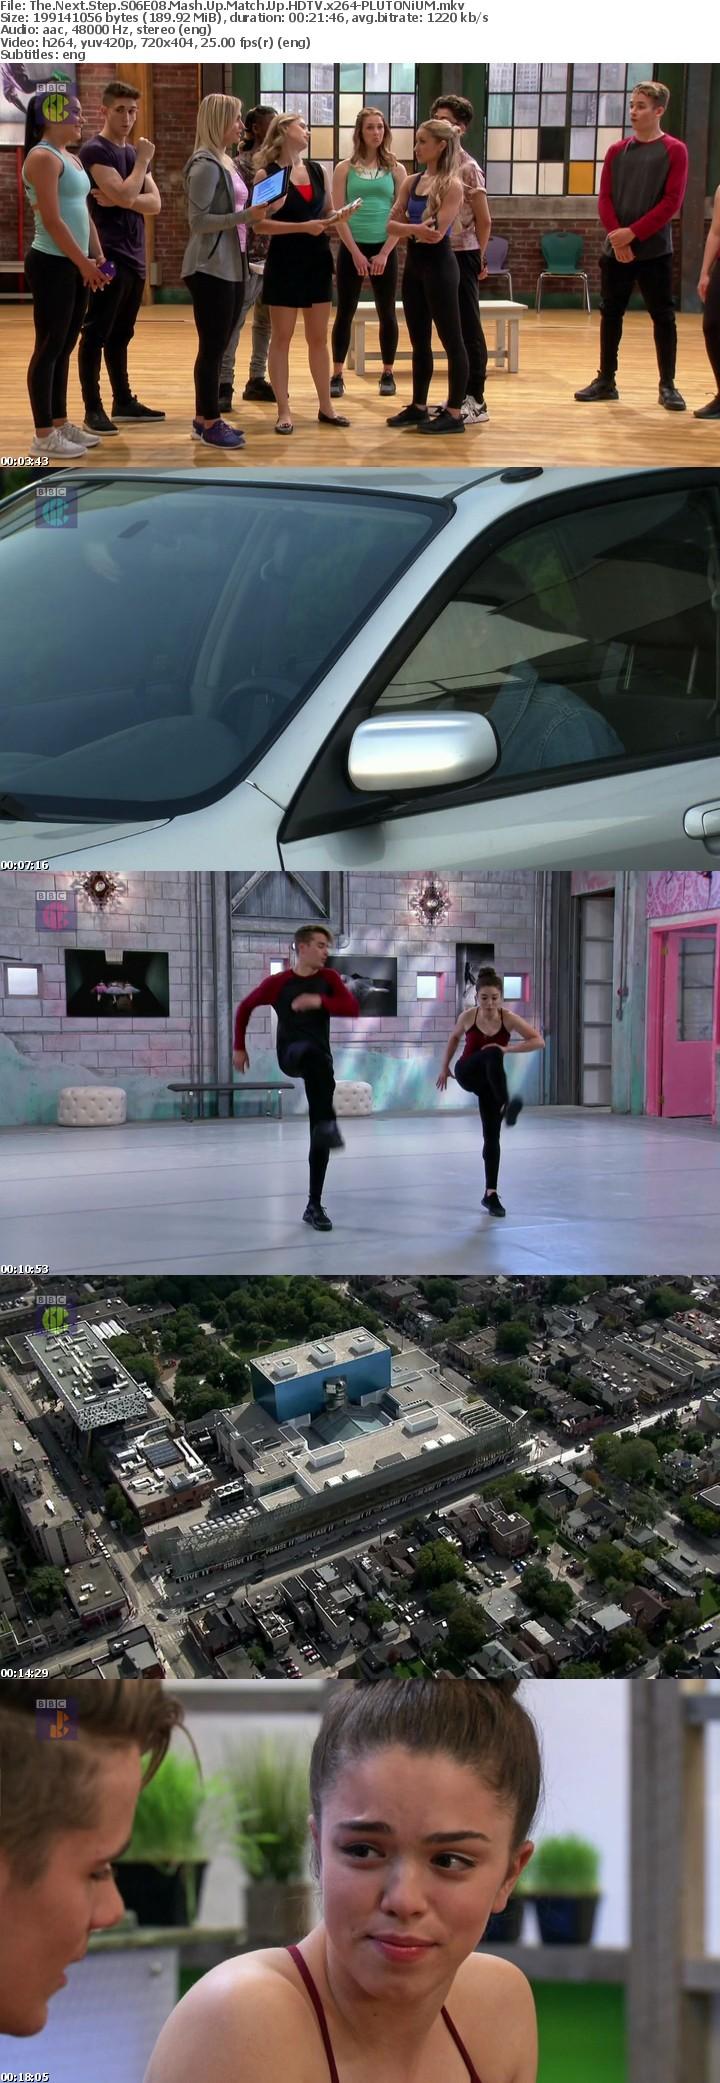 The Next Step S06E08 Mash Up Match Up HDTV x264-PLUTONiUM